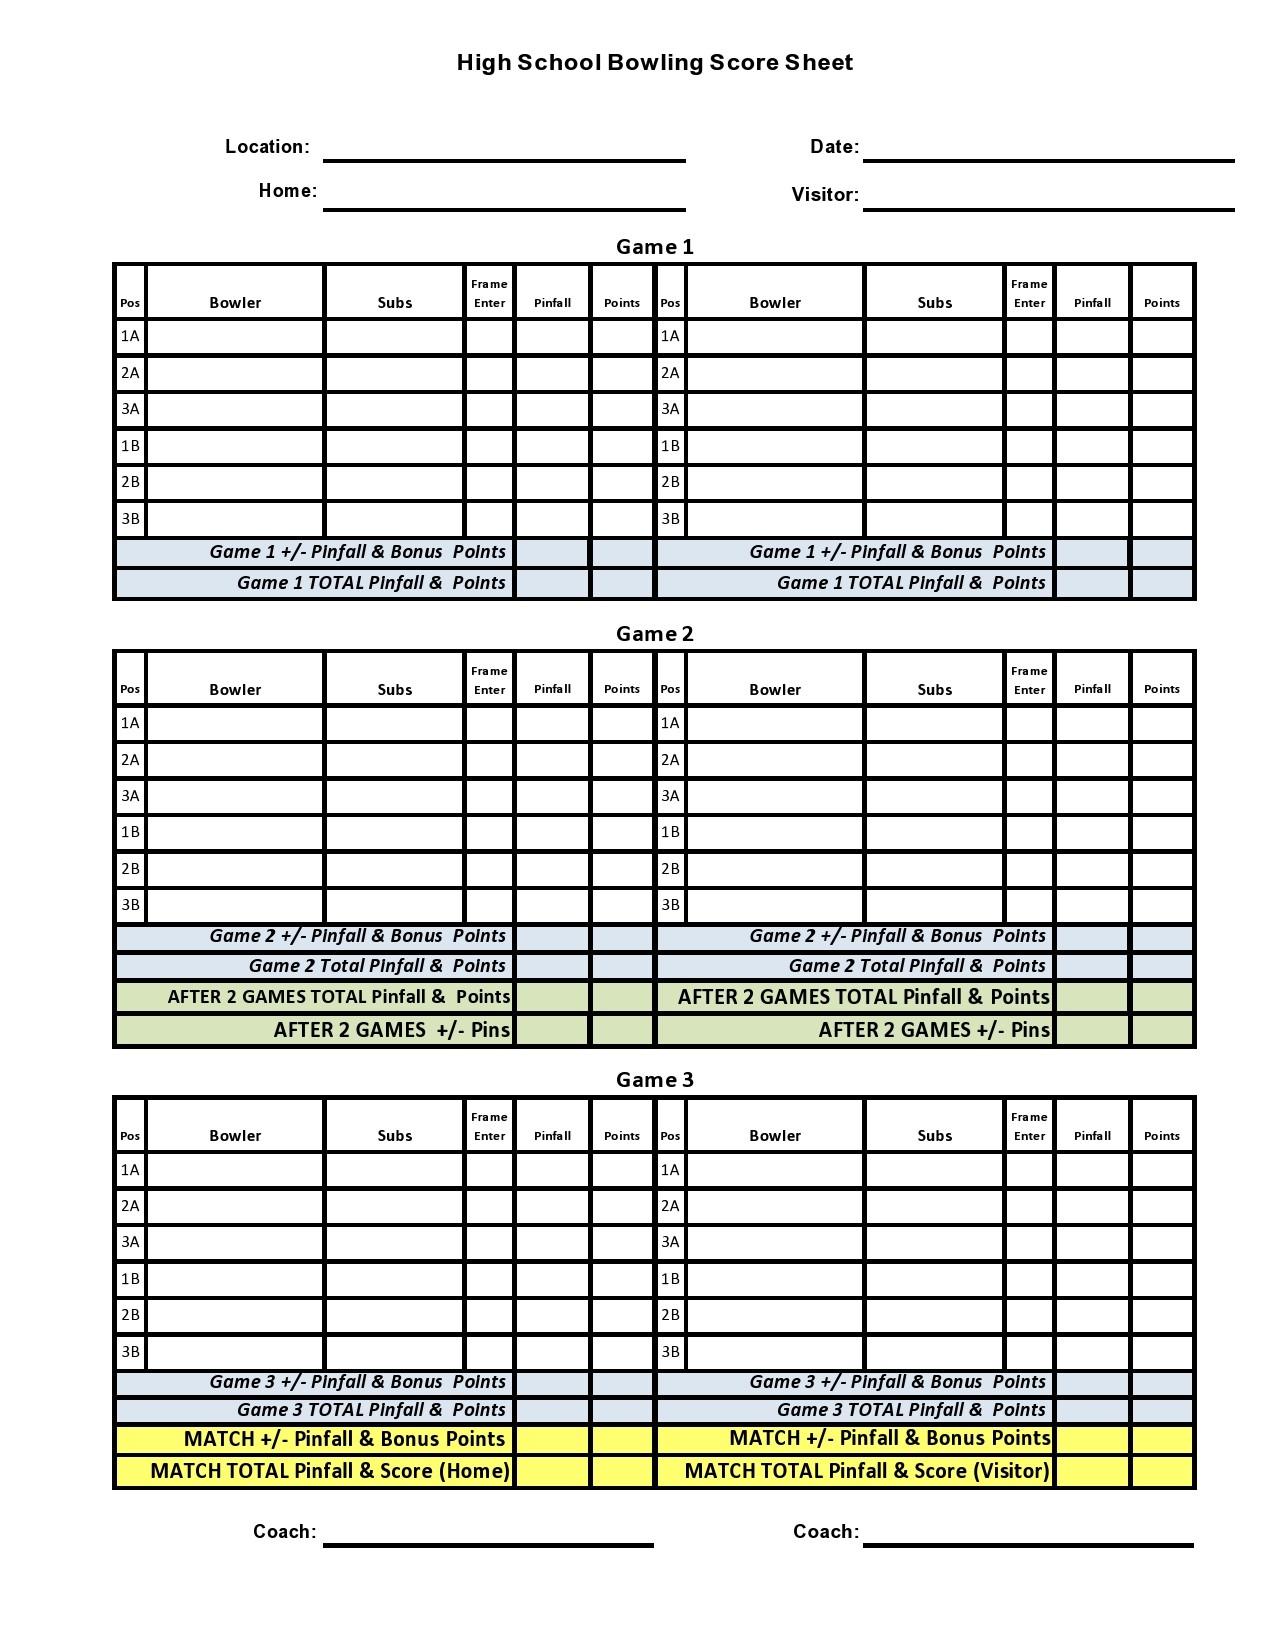 Free bowling score sheet 20